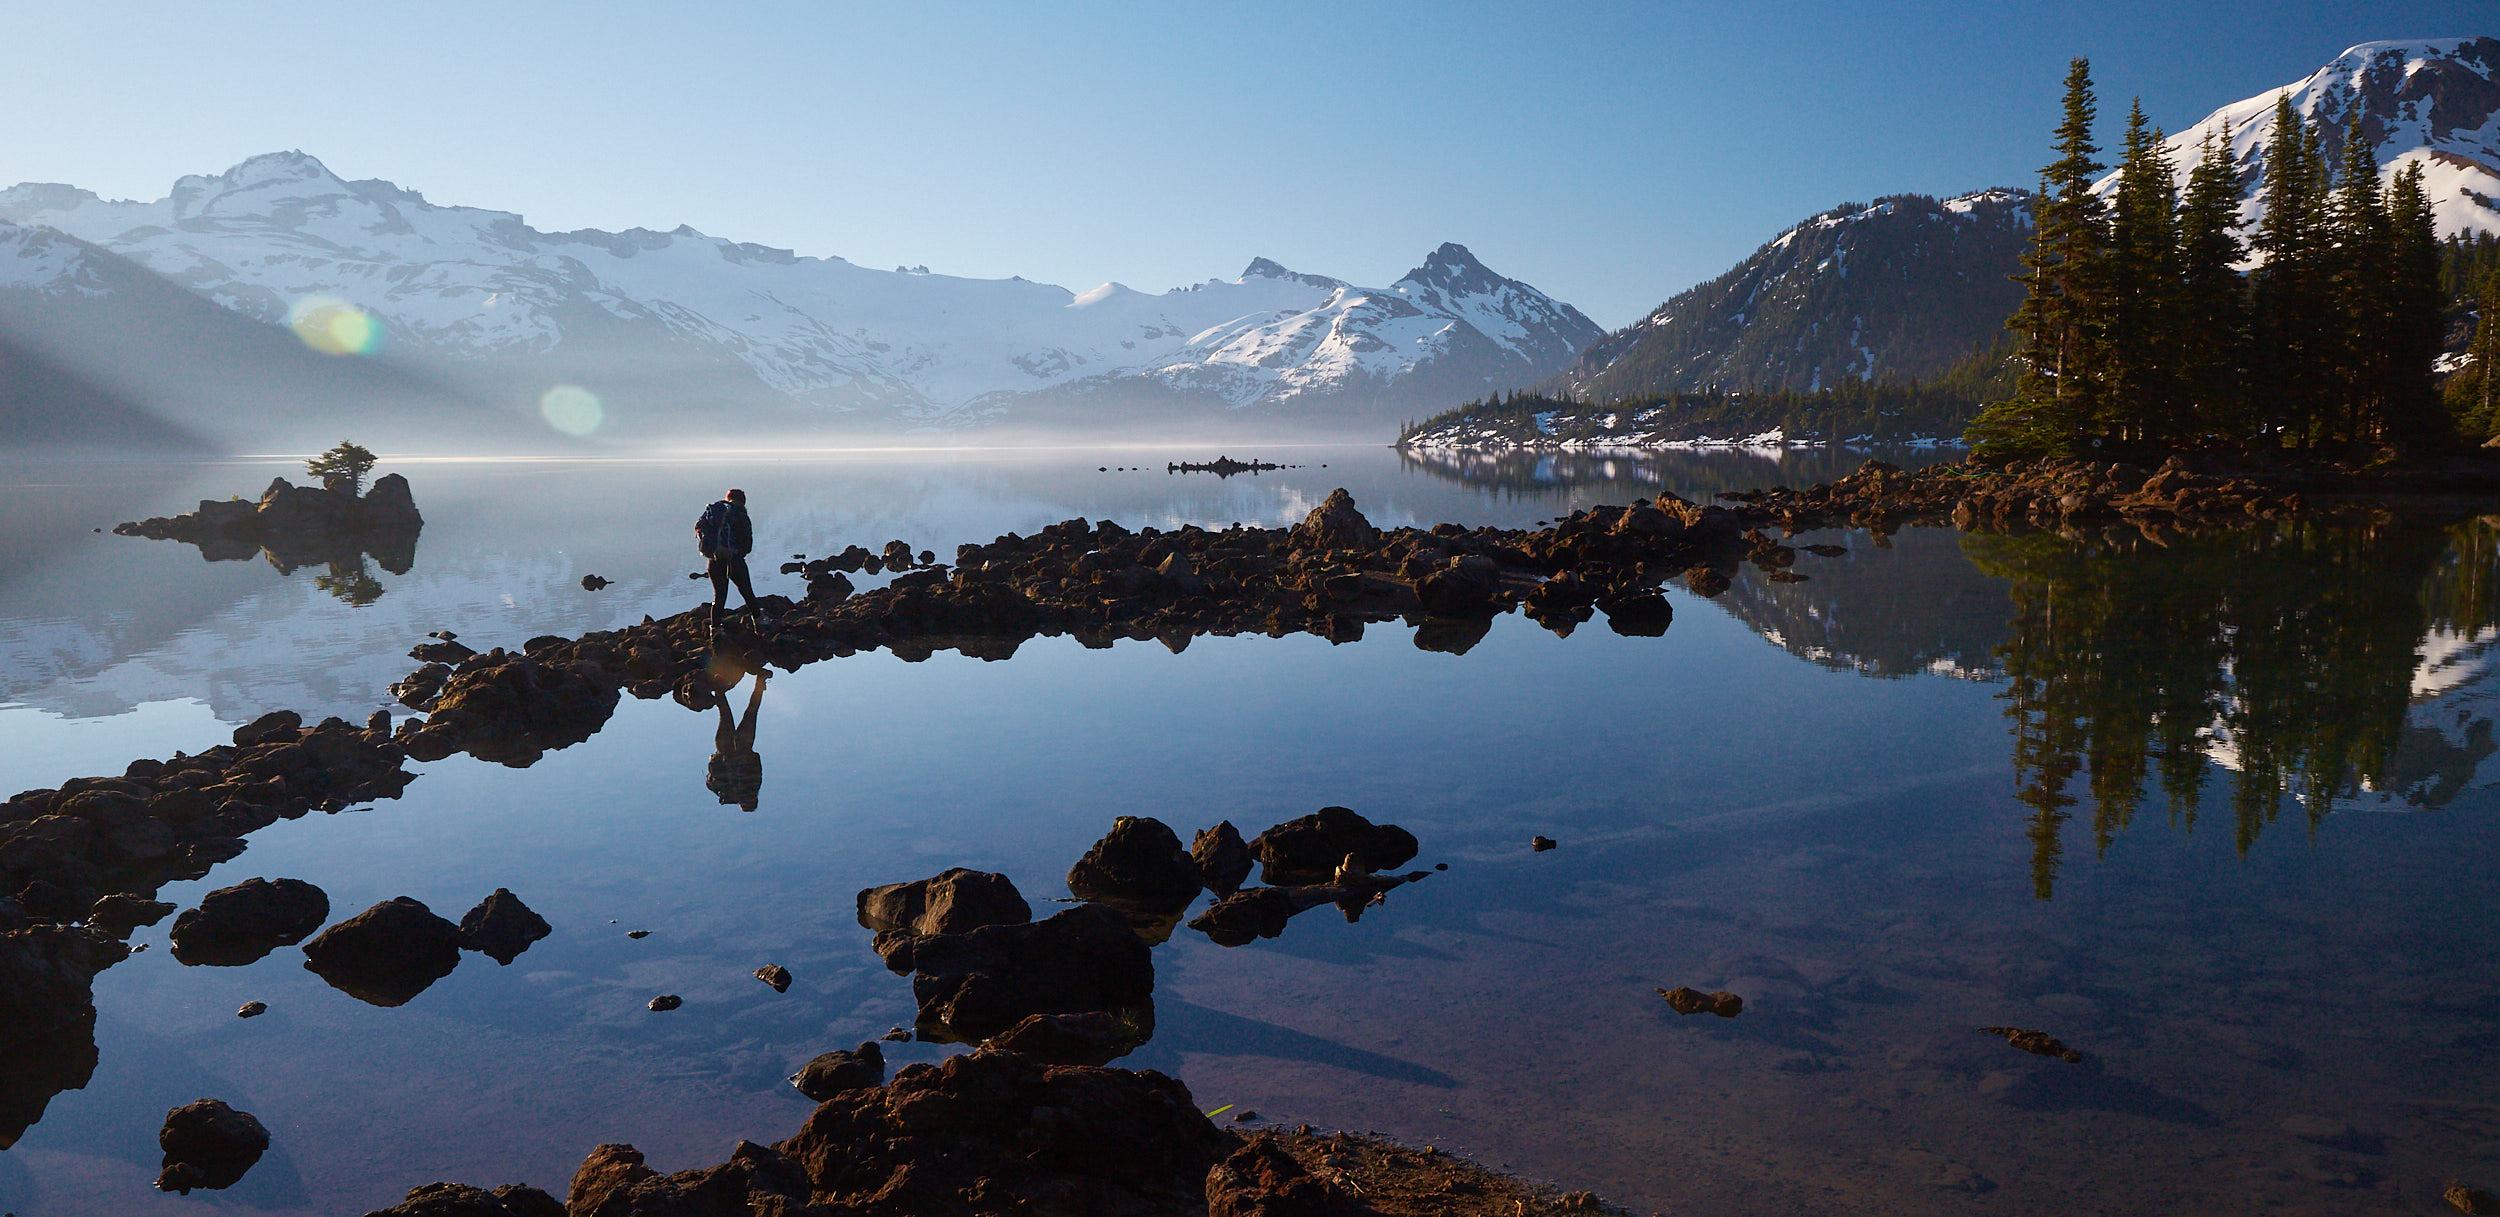 Camping at Garibaldi Lake 12.jpg